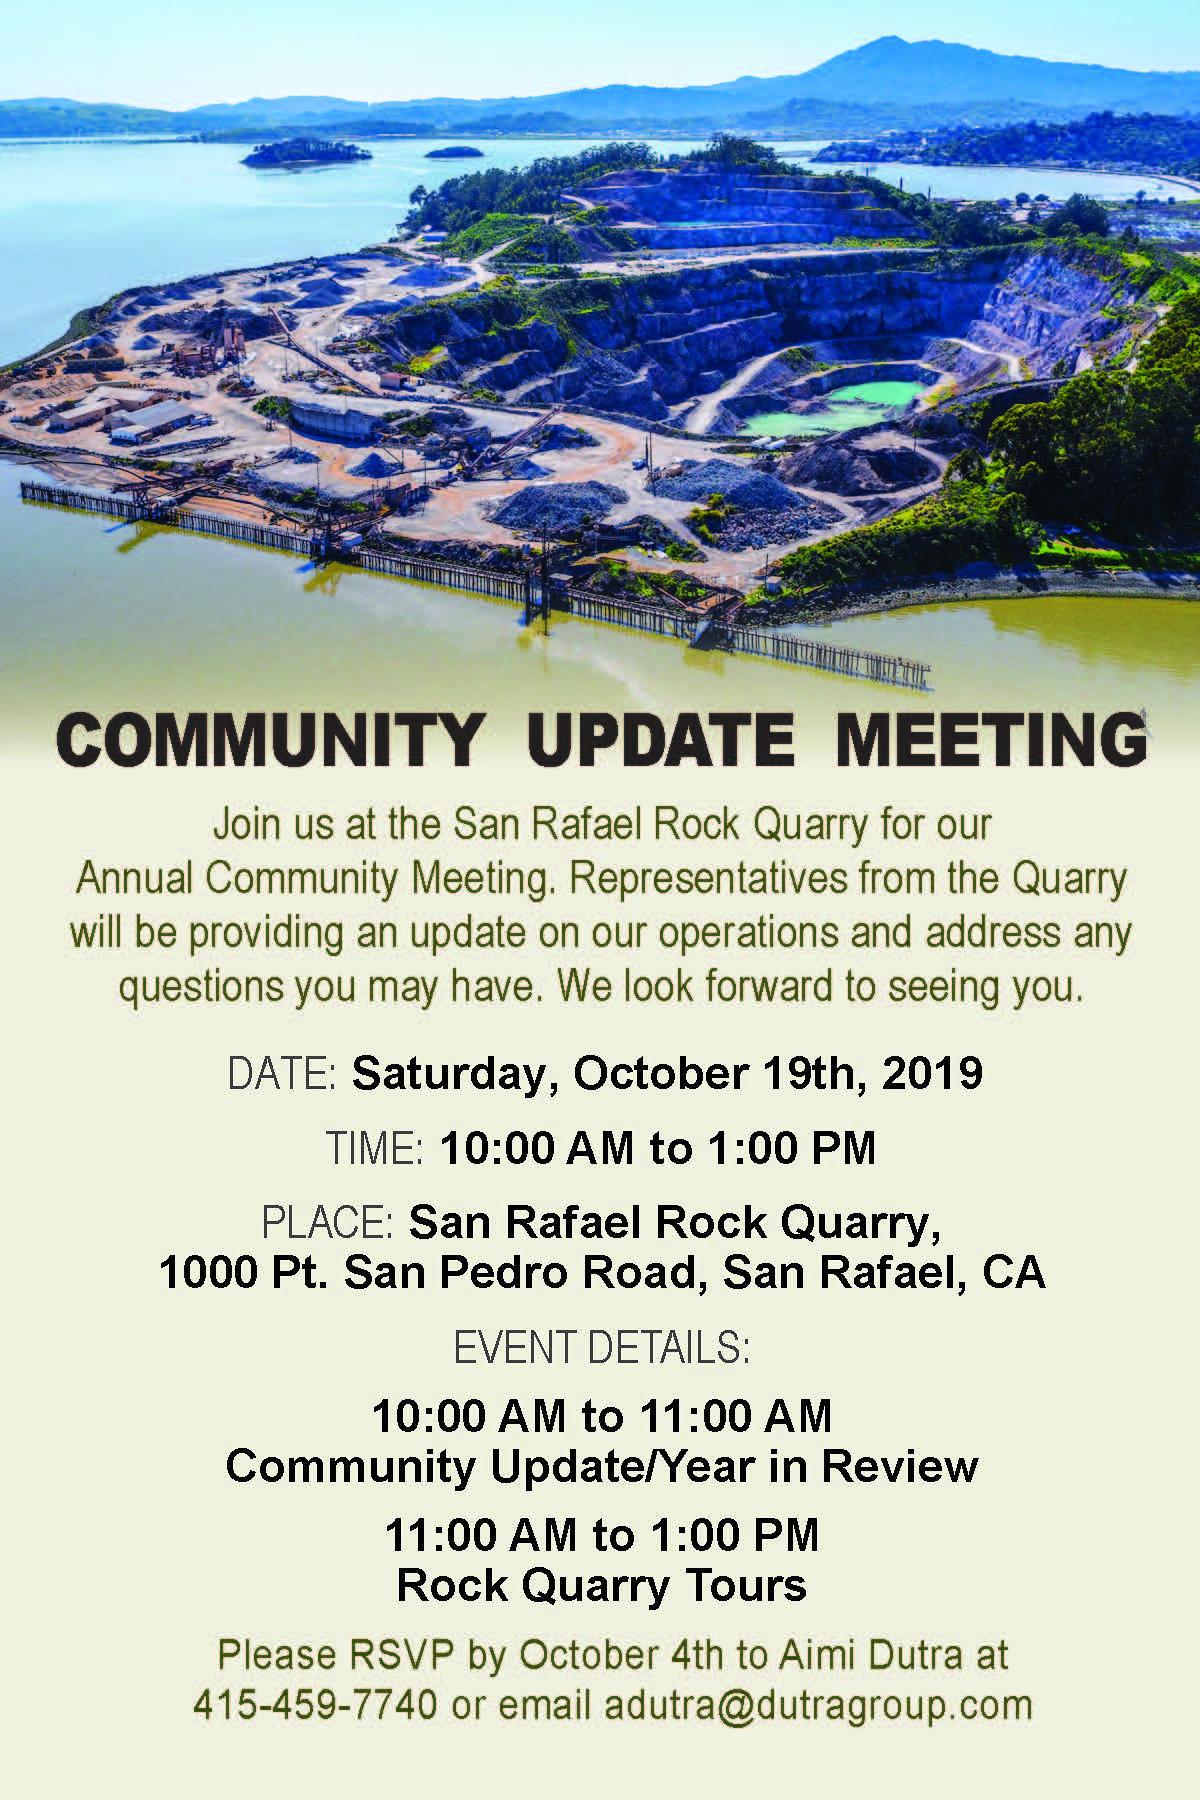 2019 Community Meeting Invitation_v2-1.jpg